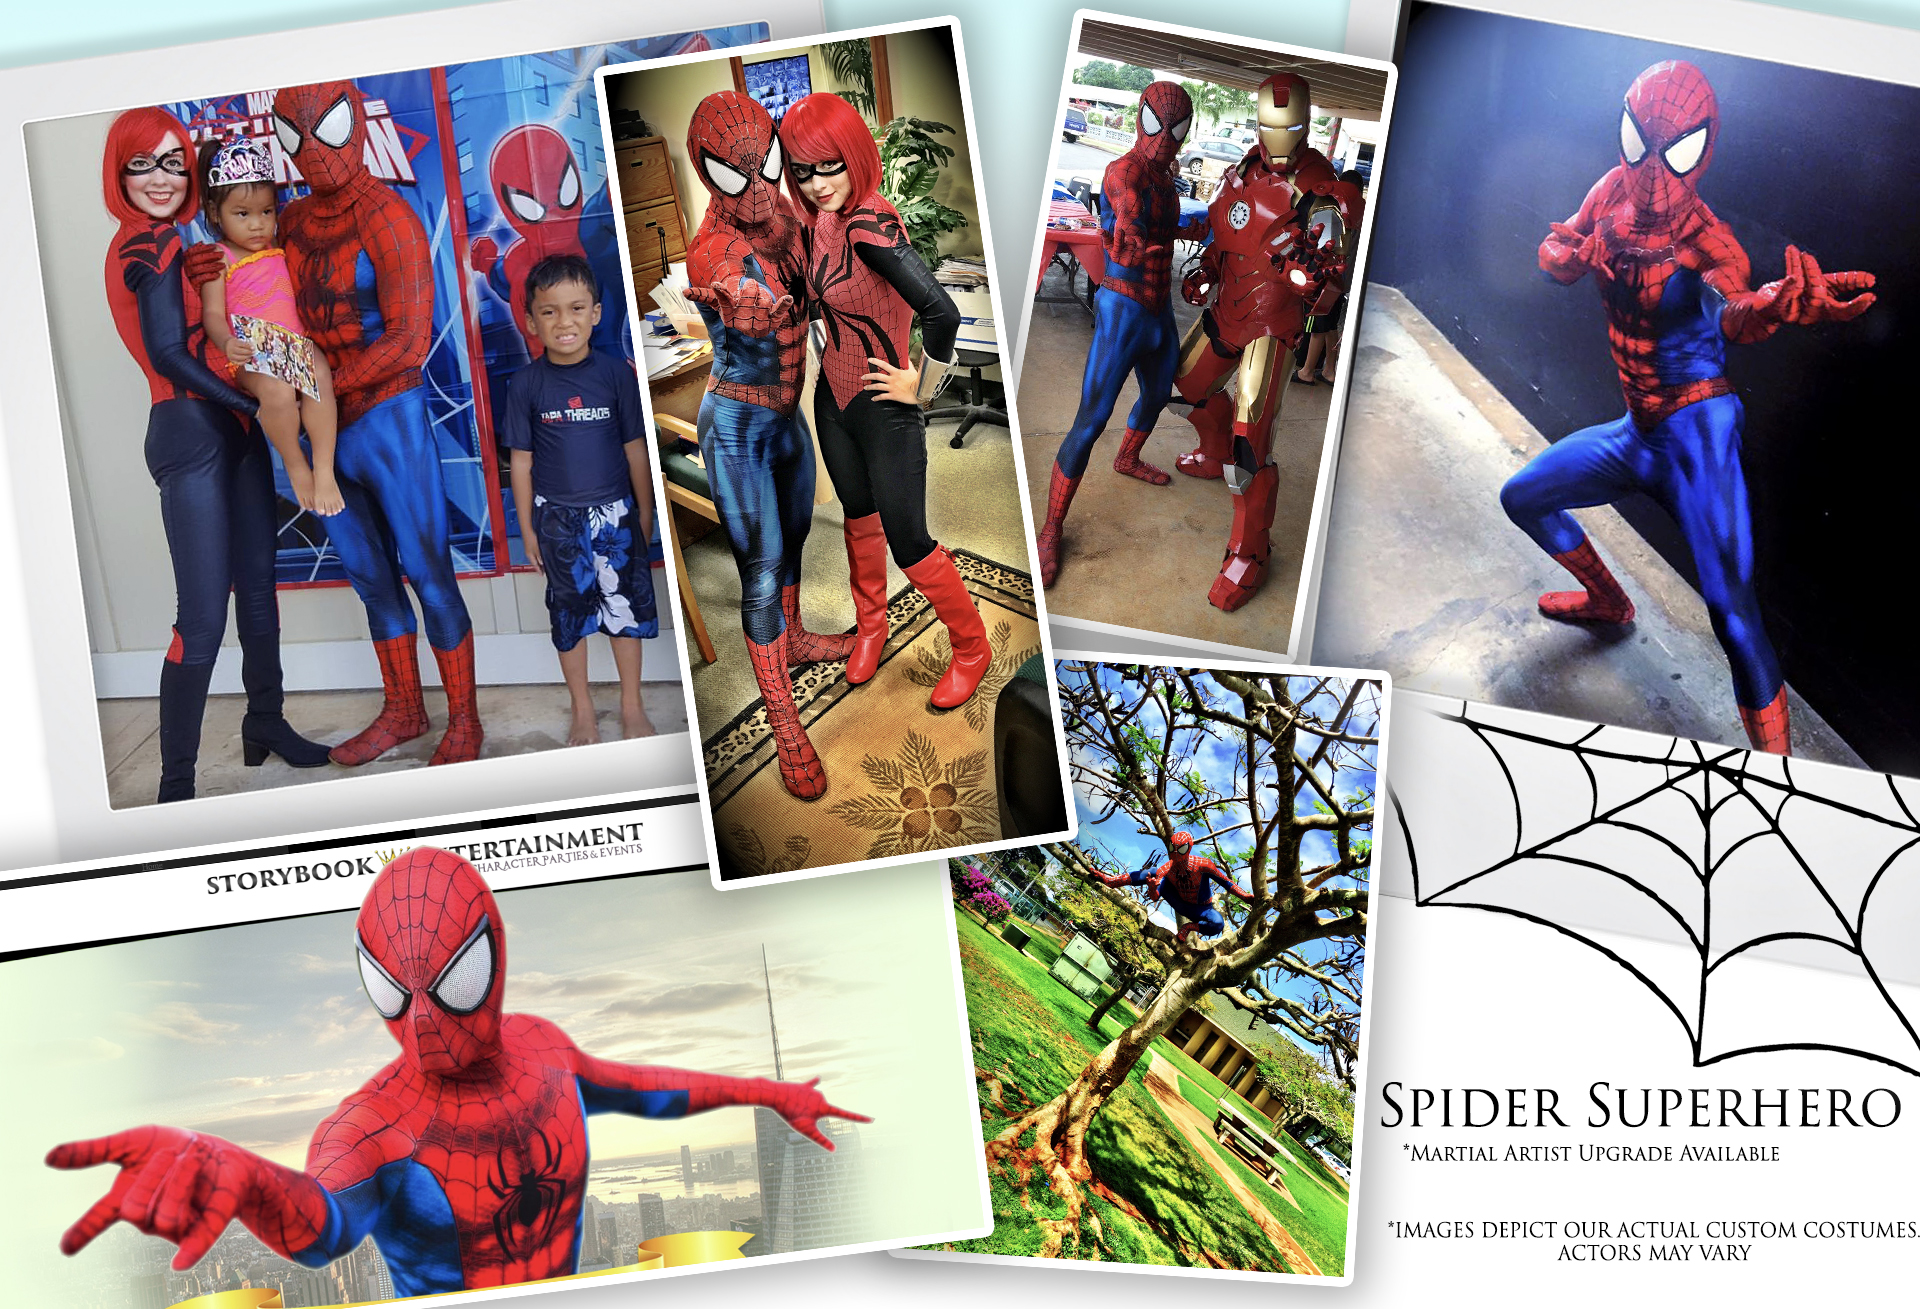 Spider Superhero